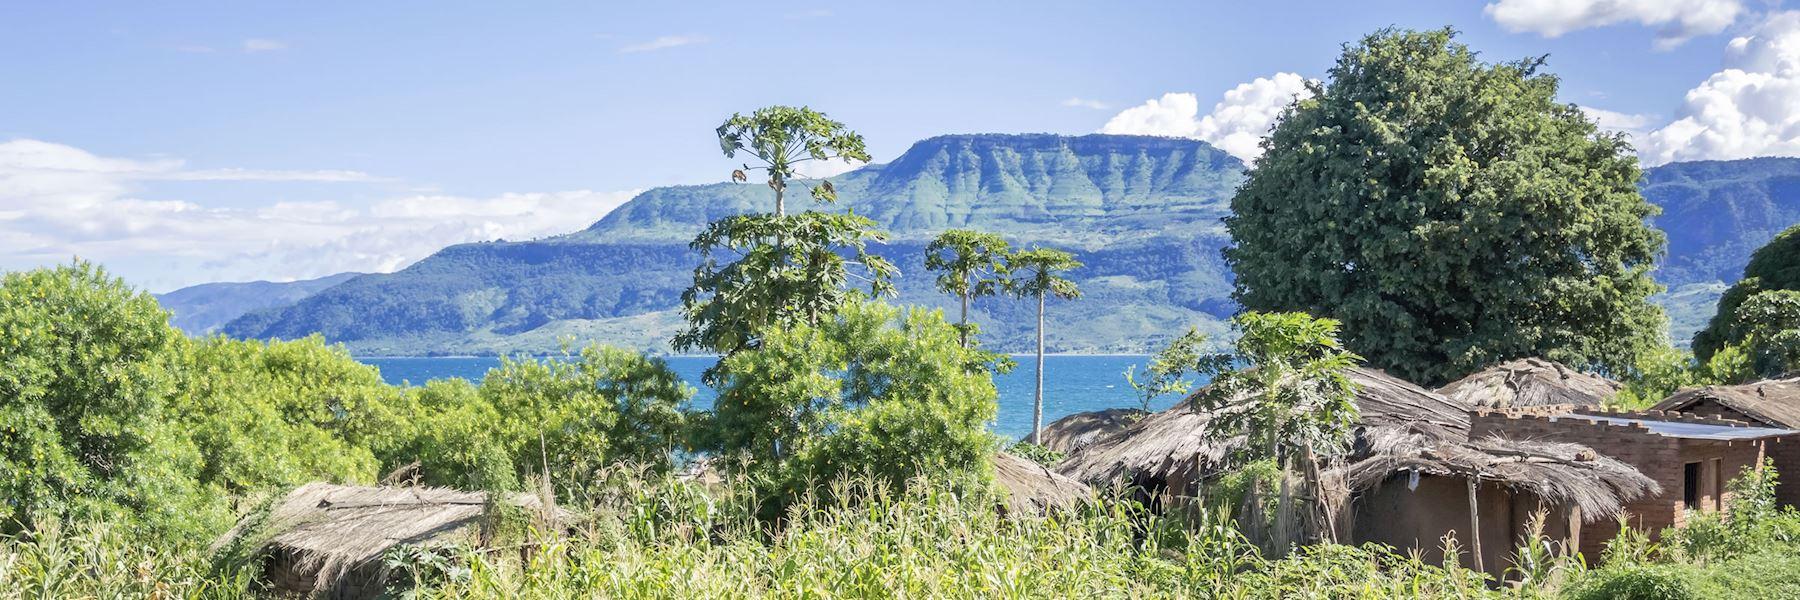 Malawi travel guides